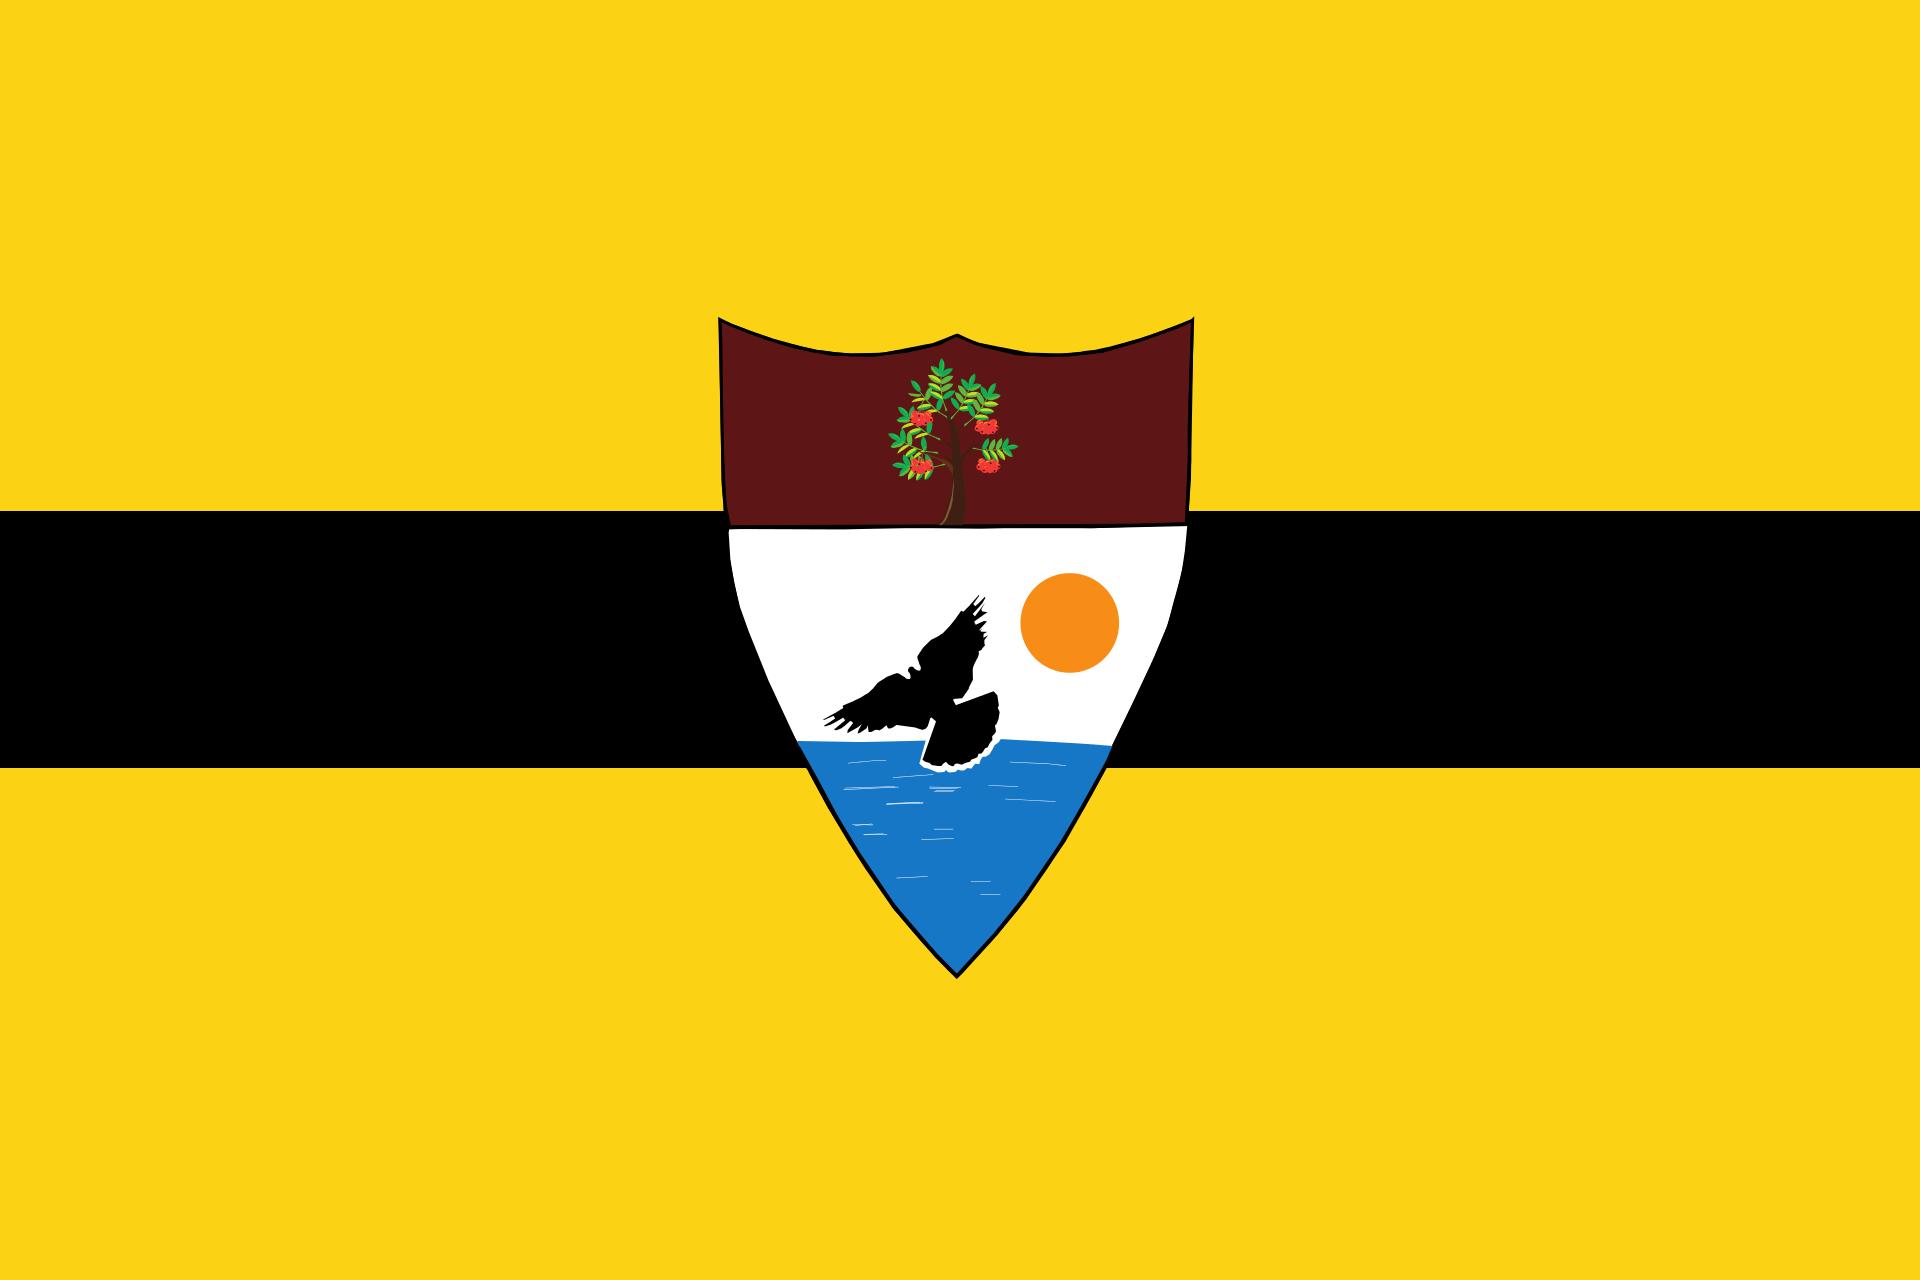 Le drapeau du Liberland